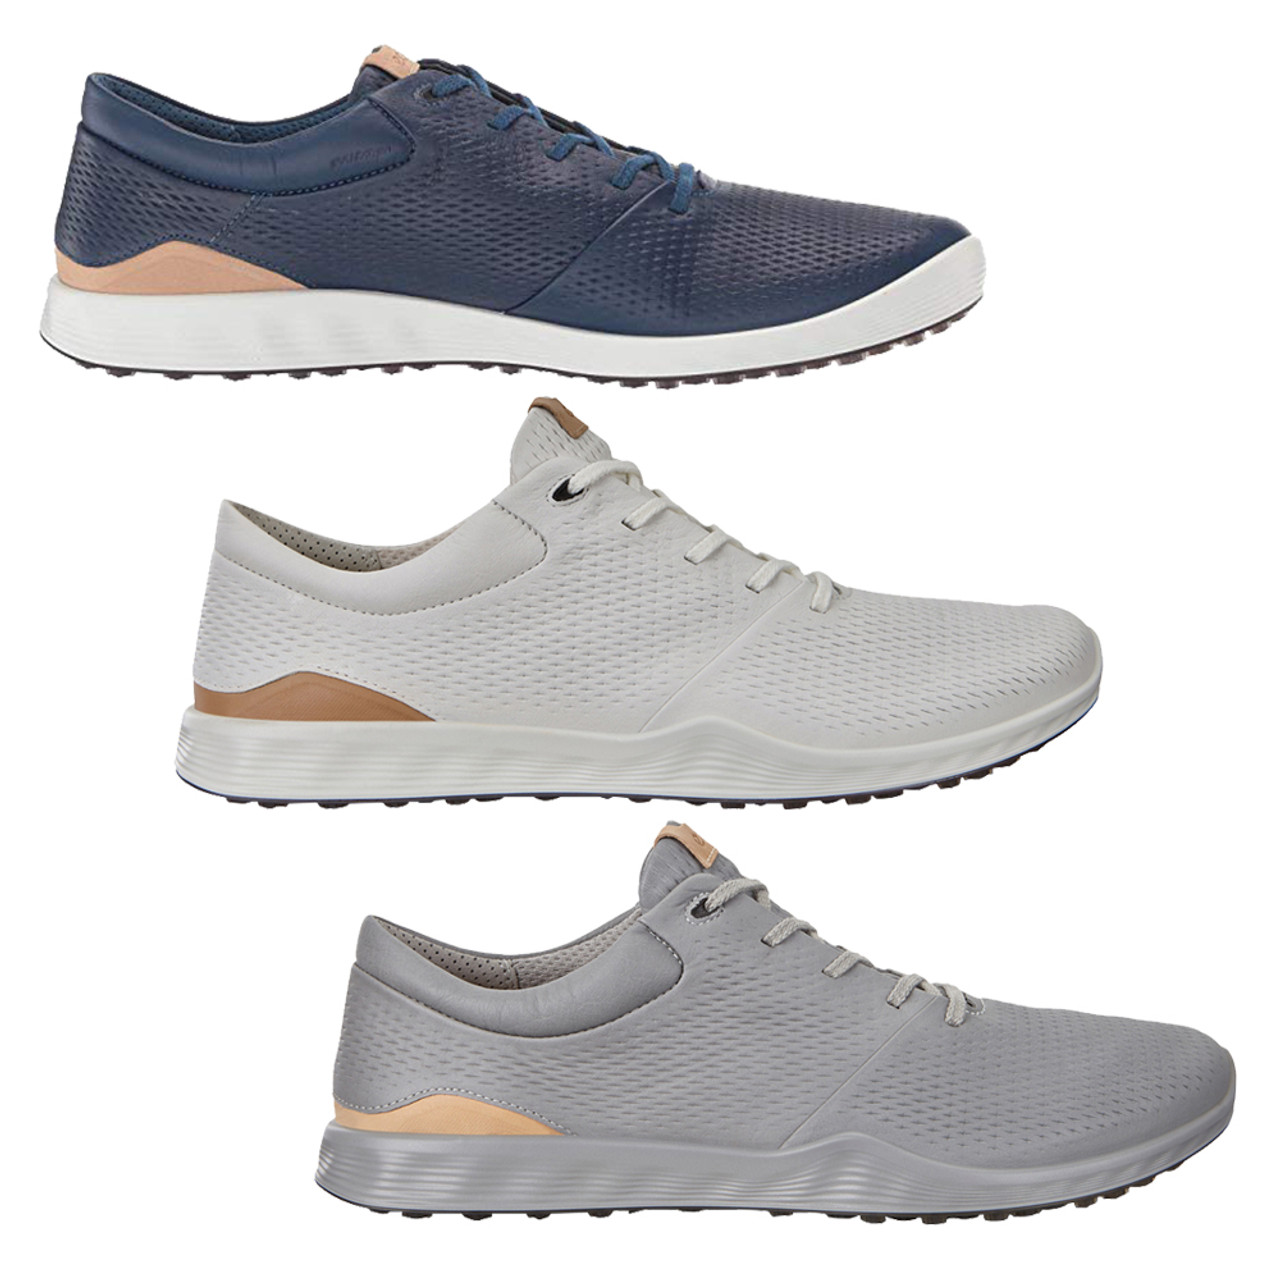 ECCO S-Lite Spikeless Golf Shoes 2019